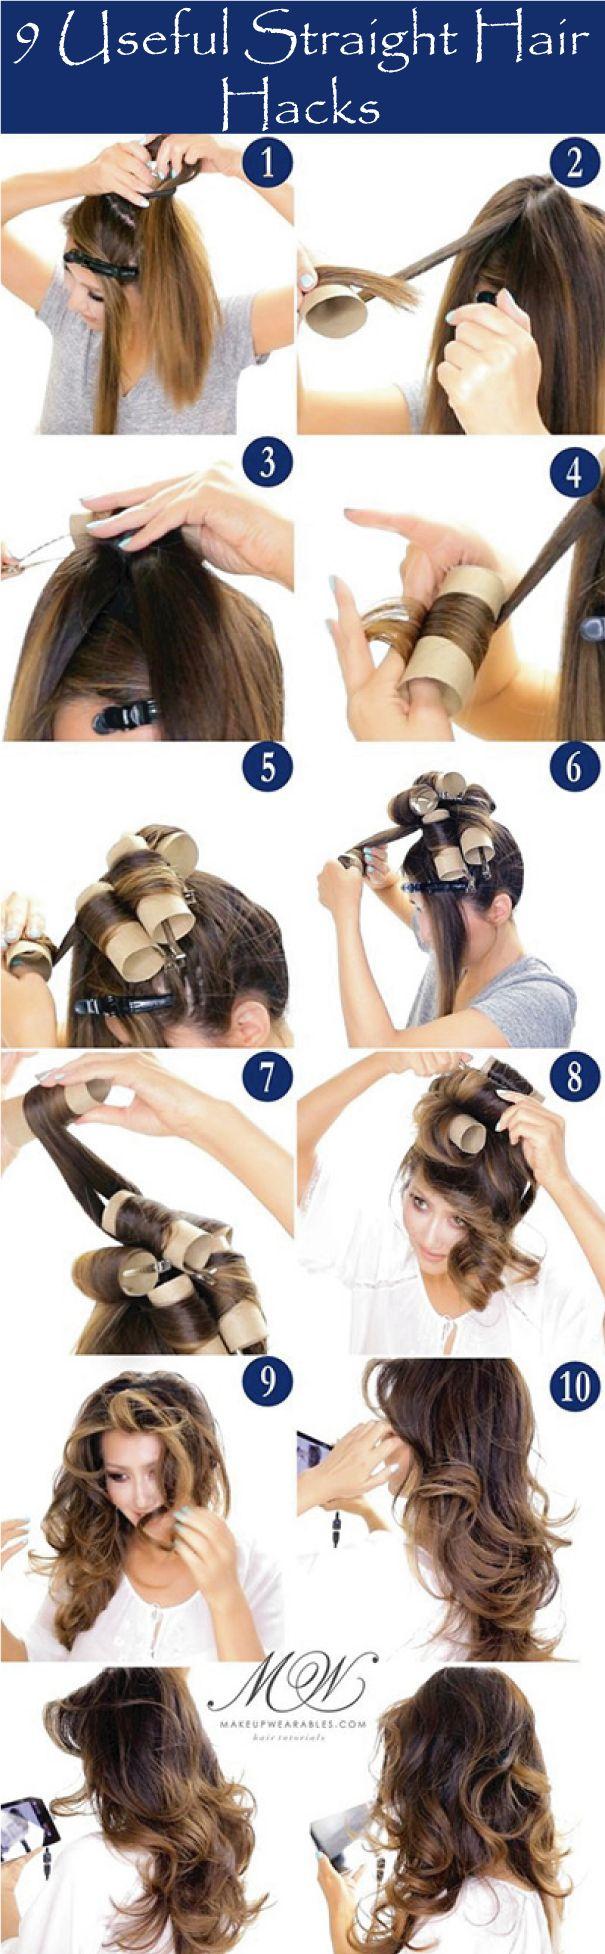 9 Useful Straight Hair Hacks For Hairs